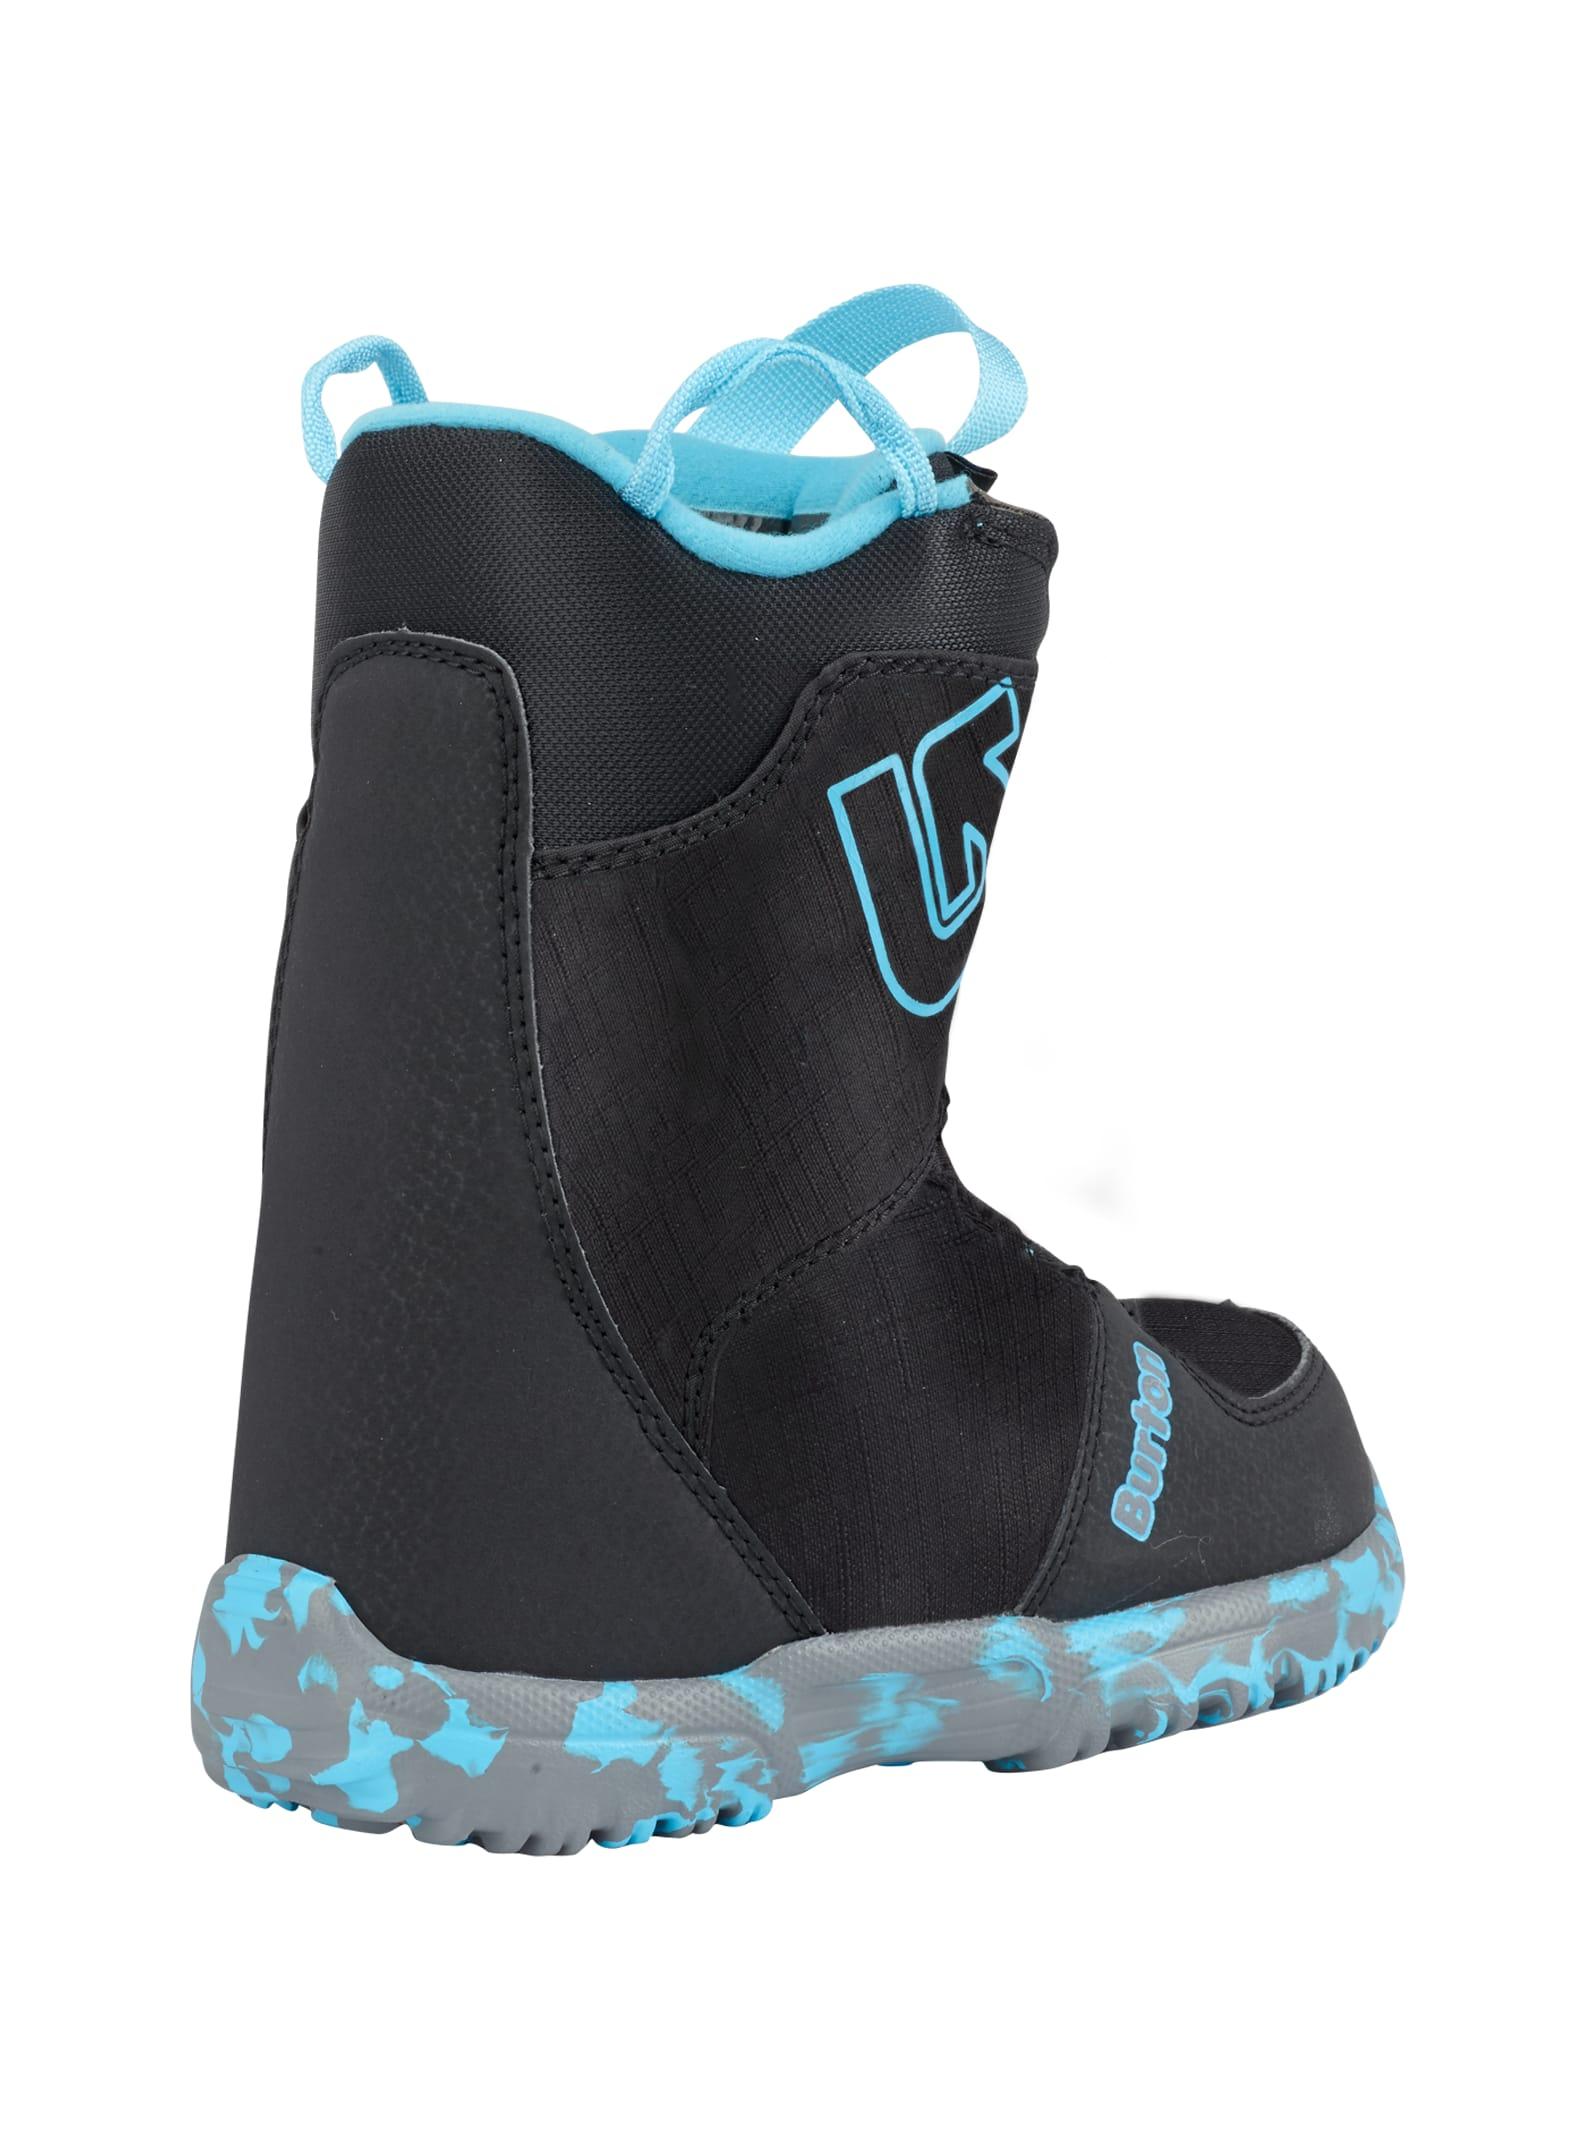 564799150a67 Kids' Burton Grom Boa® Snowboard Boot | Burton.com Winter 2019